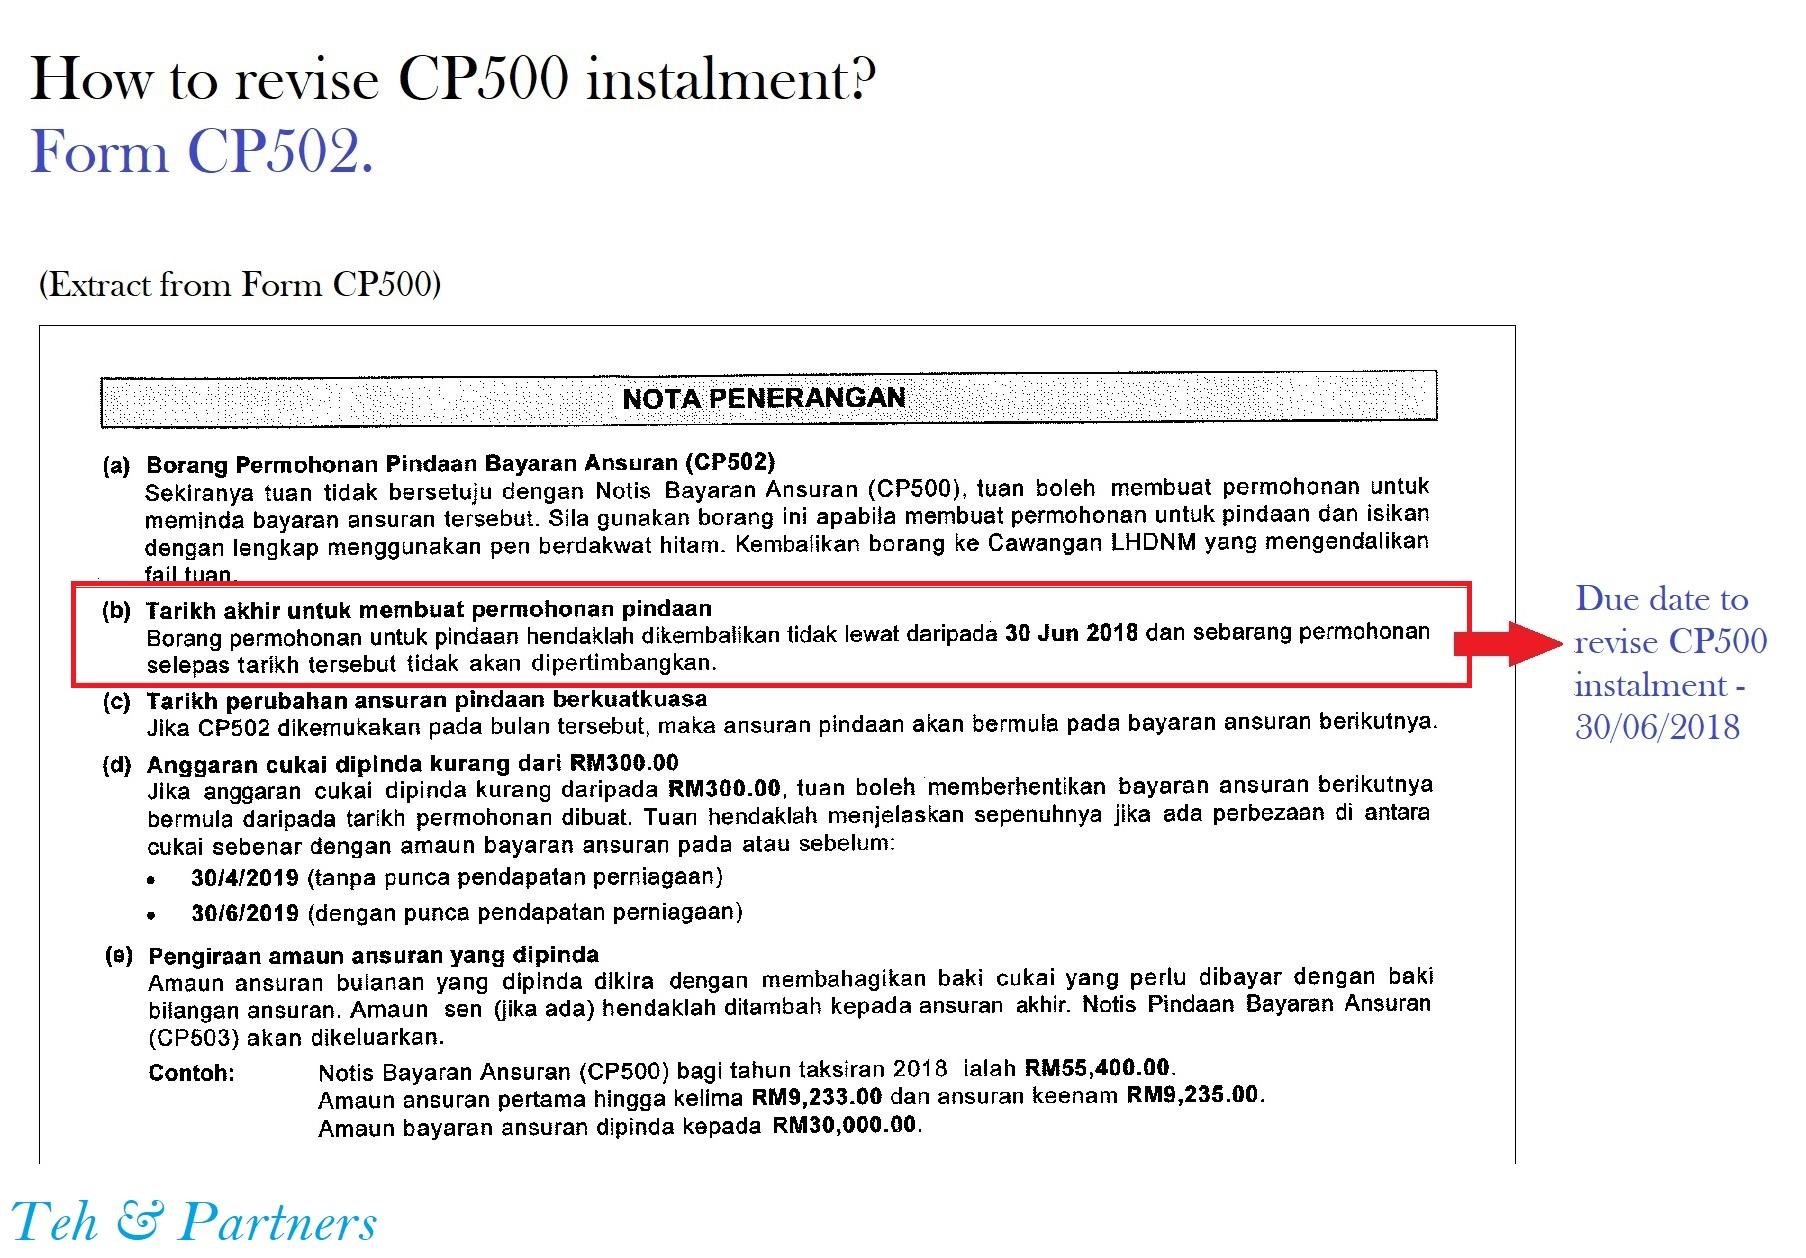 cp500 tax instalment scheme